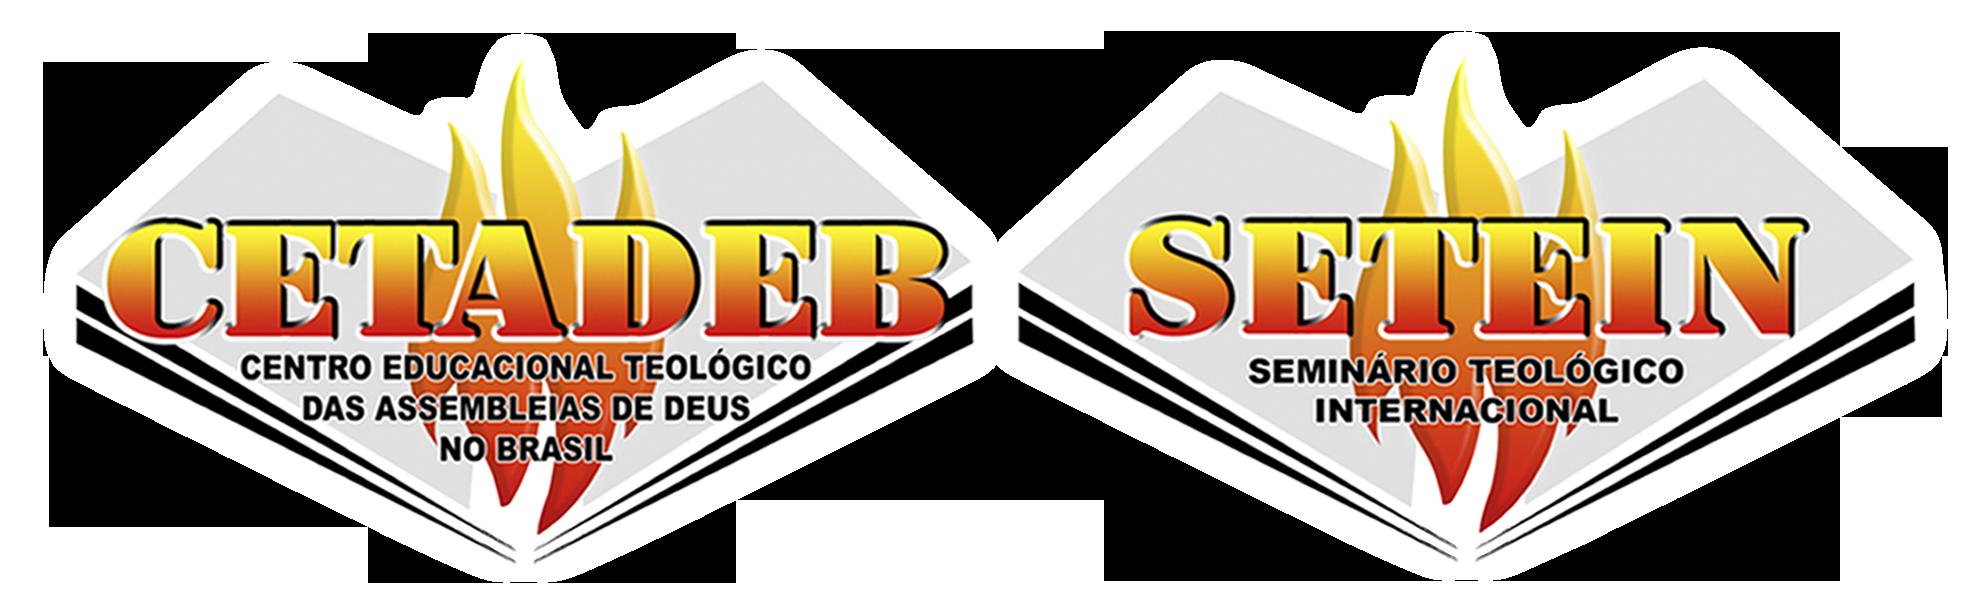 CETADEB / SETEIN